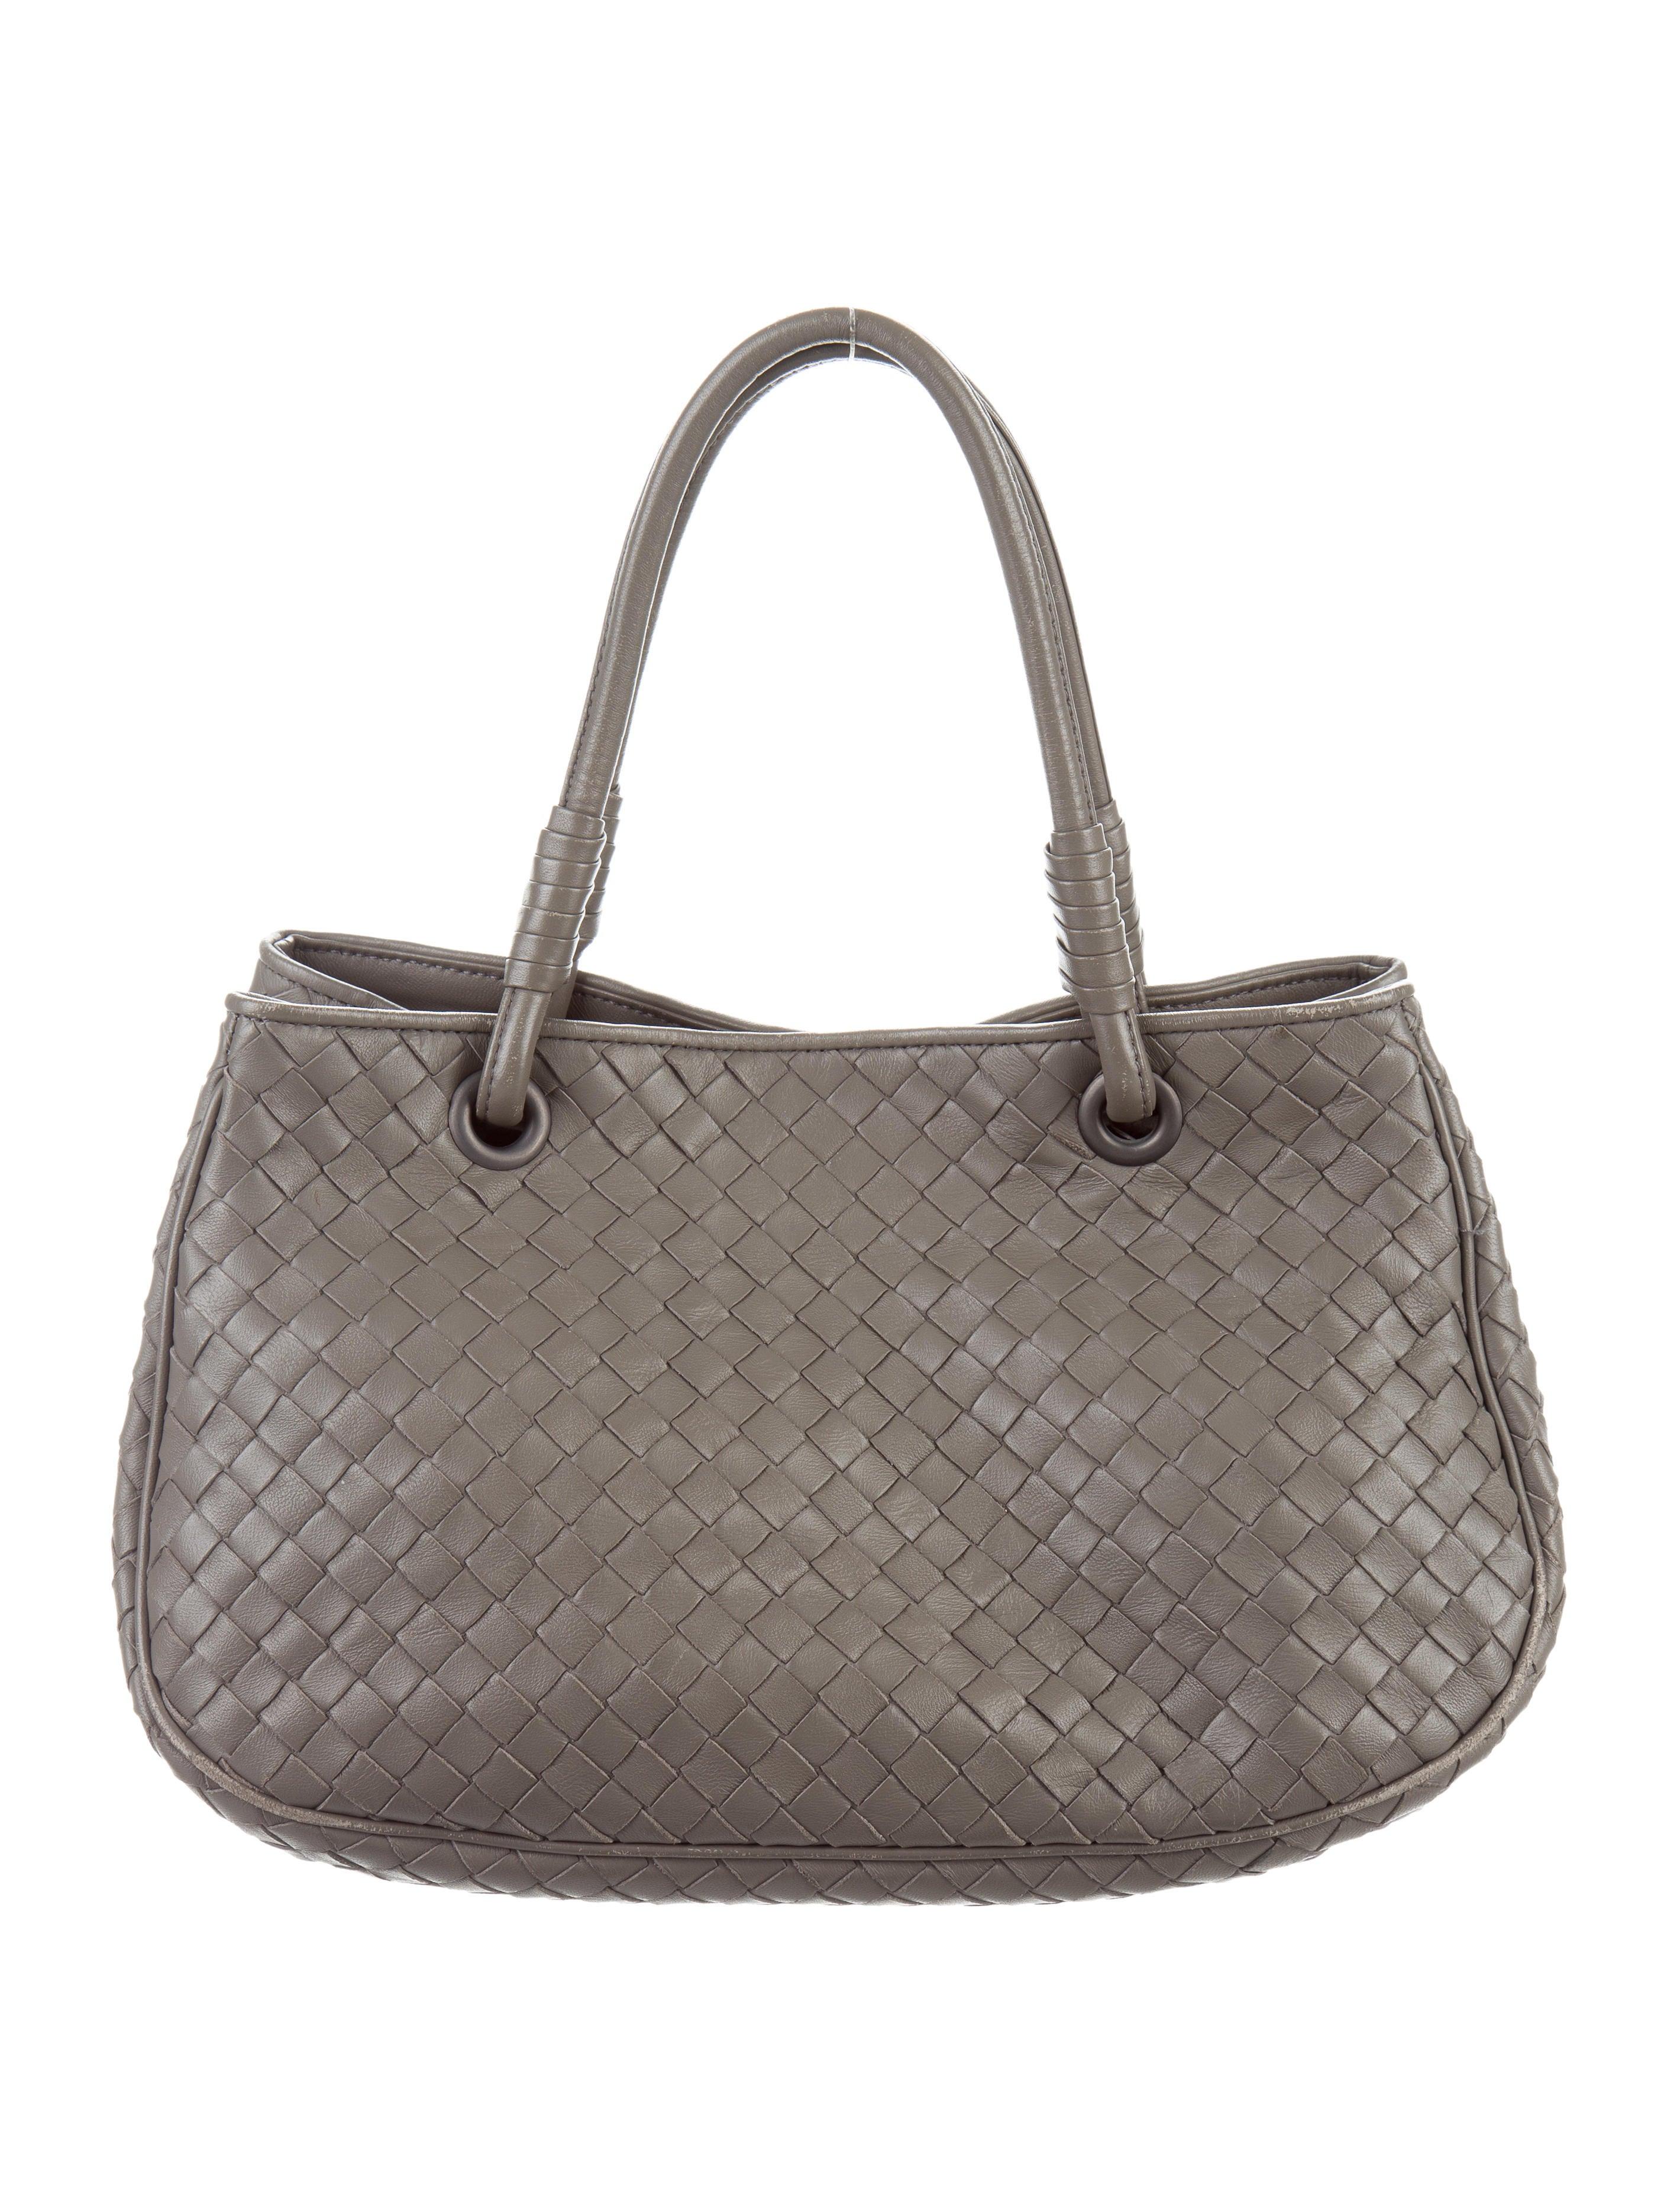 Bottega Veneta Small Intrecciato Tote Handbags  : BOT473521enlarged from www.therealreal.com size 2835 x 3740 jpeg 812kB